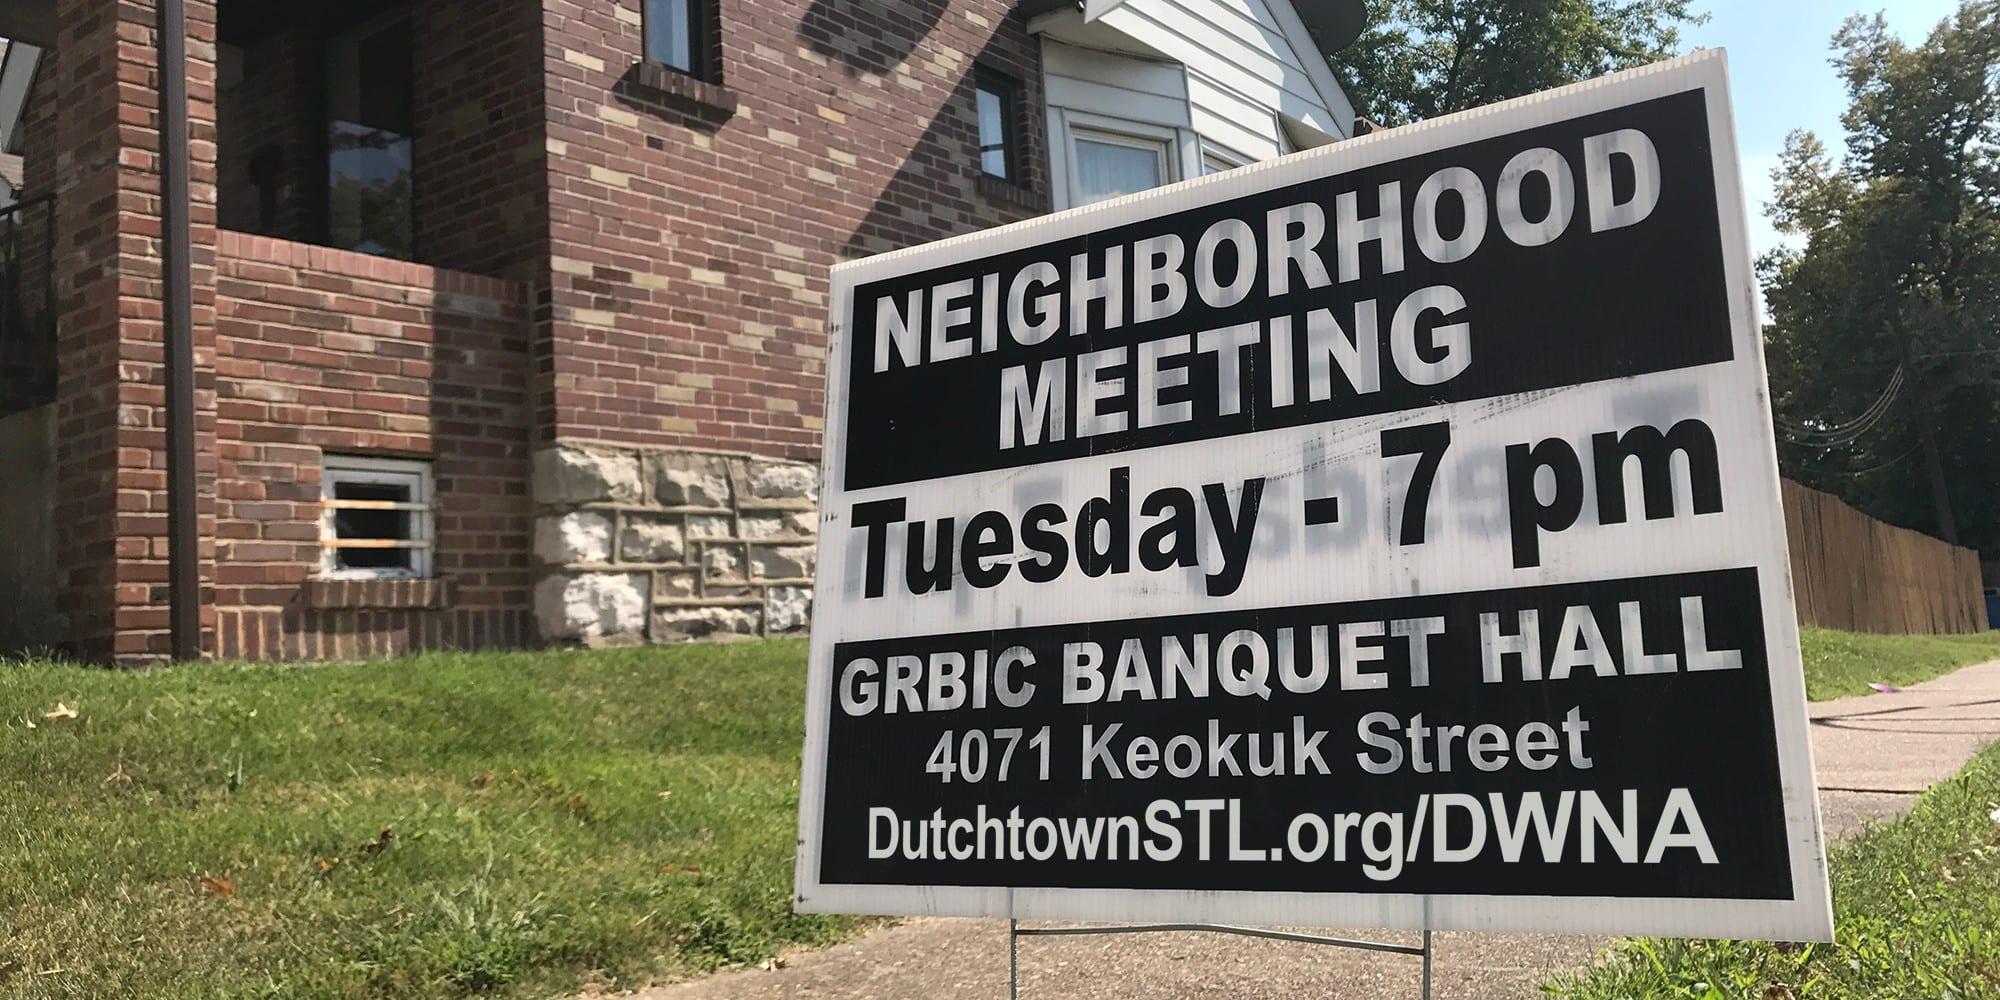 Dutchtown West Neighborhood Meeting